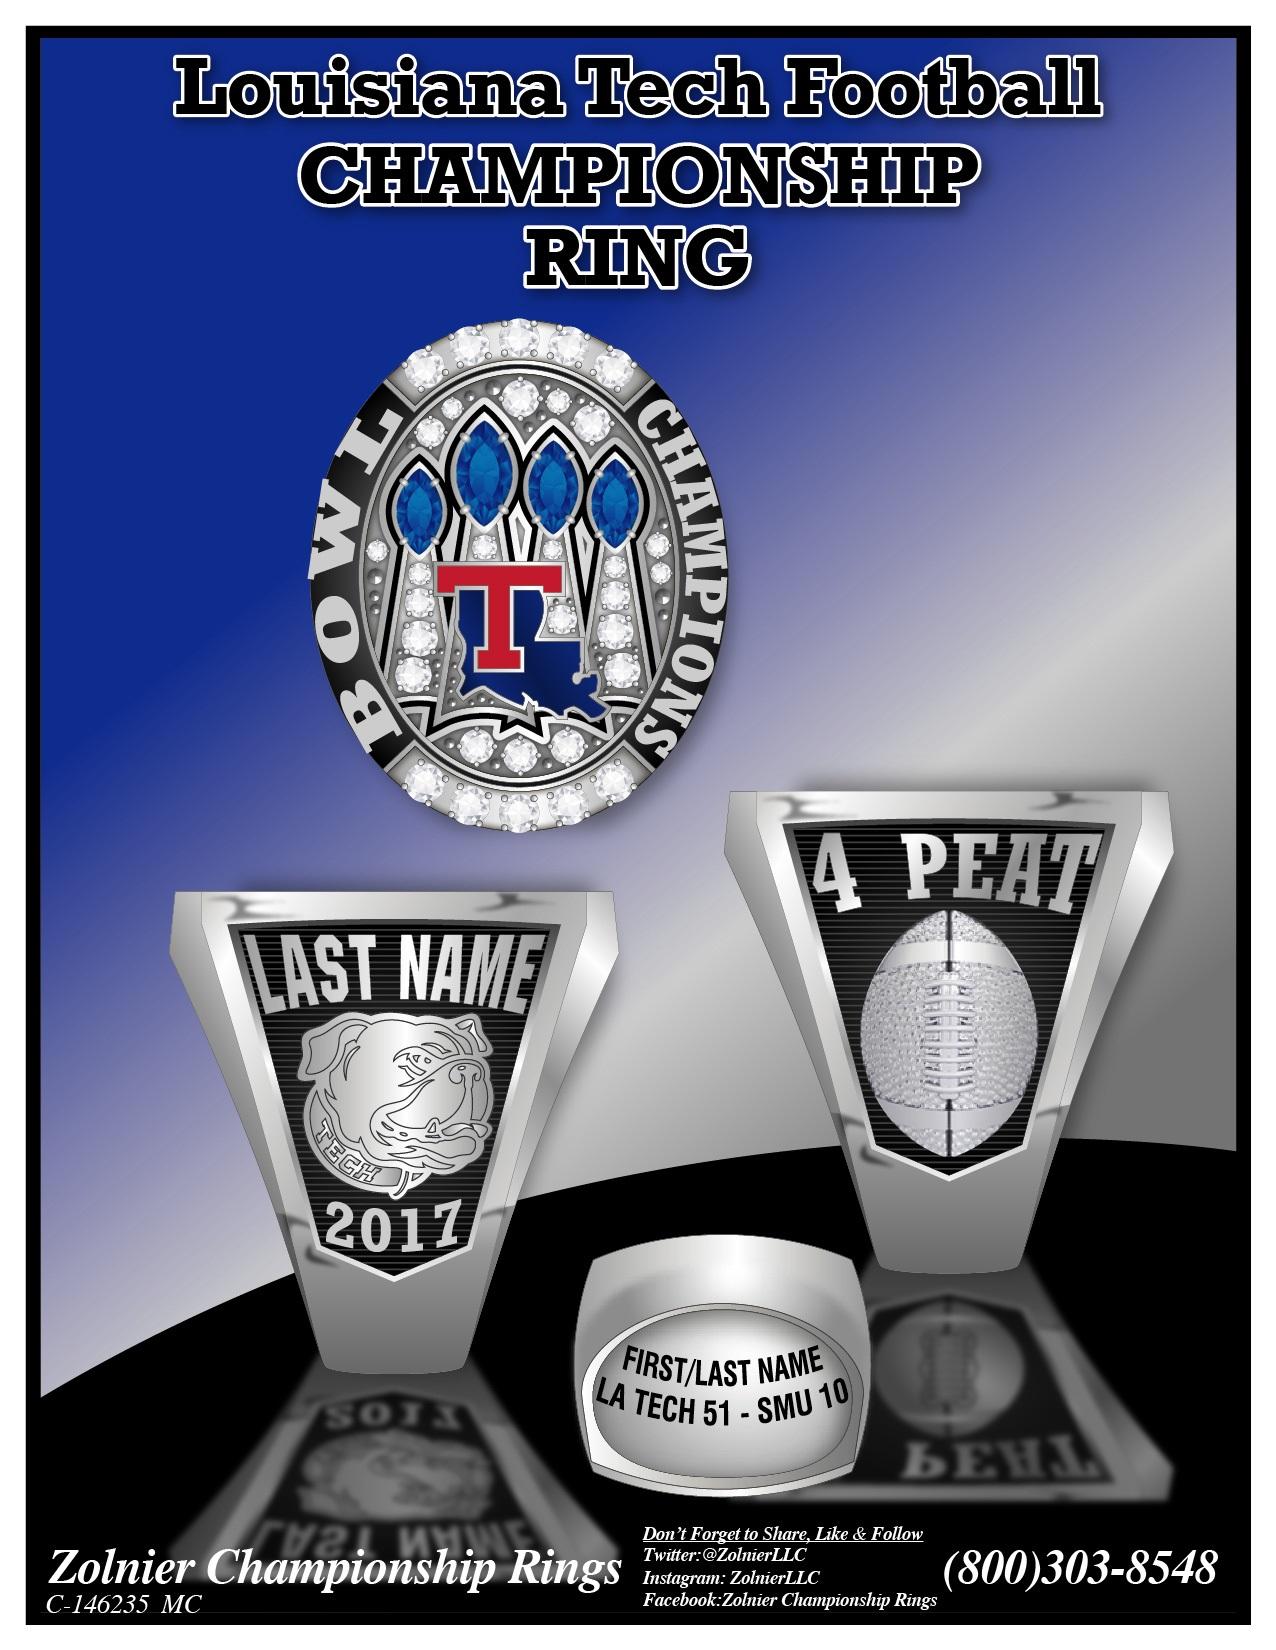 C-145231 ZOLNIER LLT Louisnana Tech Univ Football Ring 2 MC-01 (1)